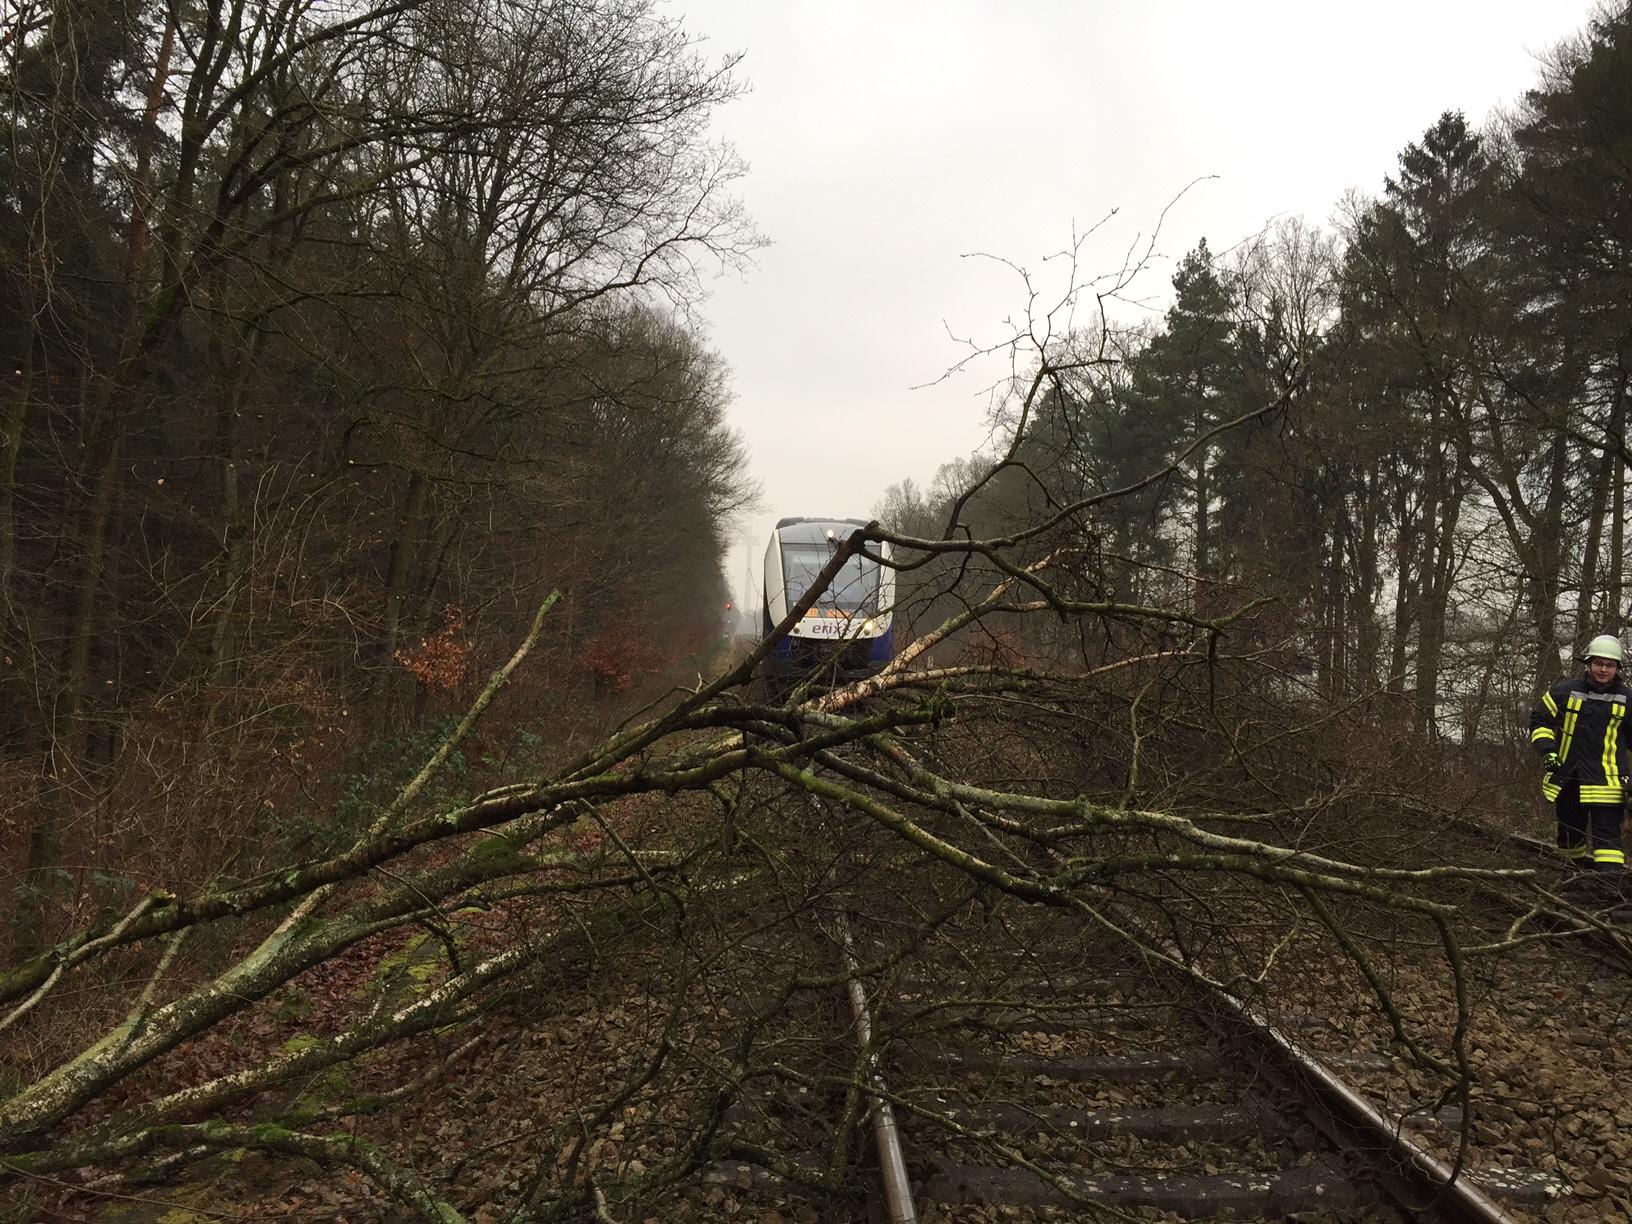 001. Baum auf Bahngleis